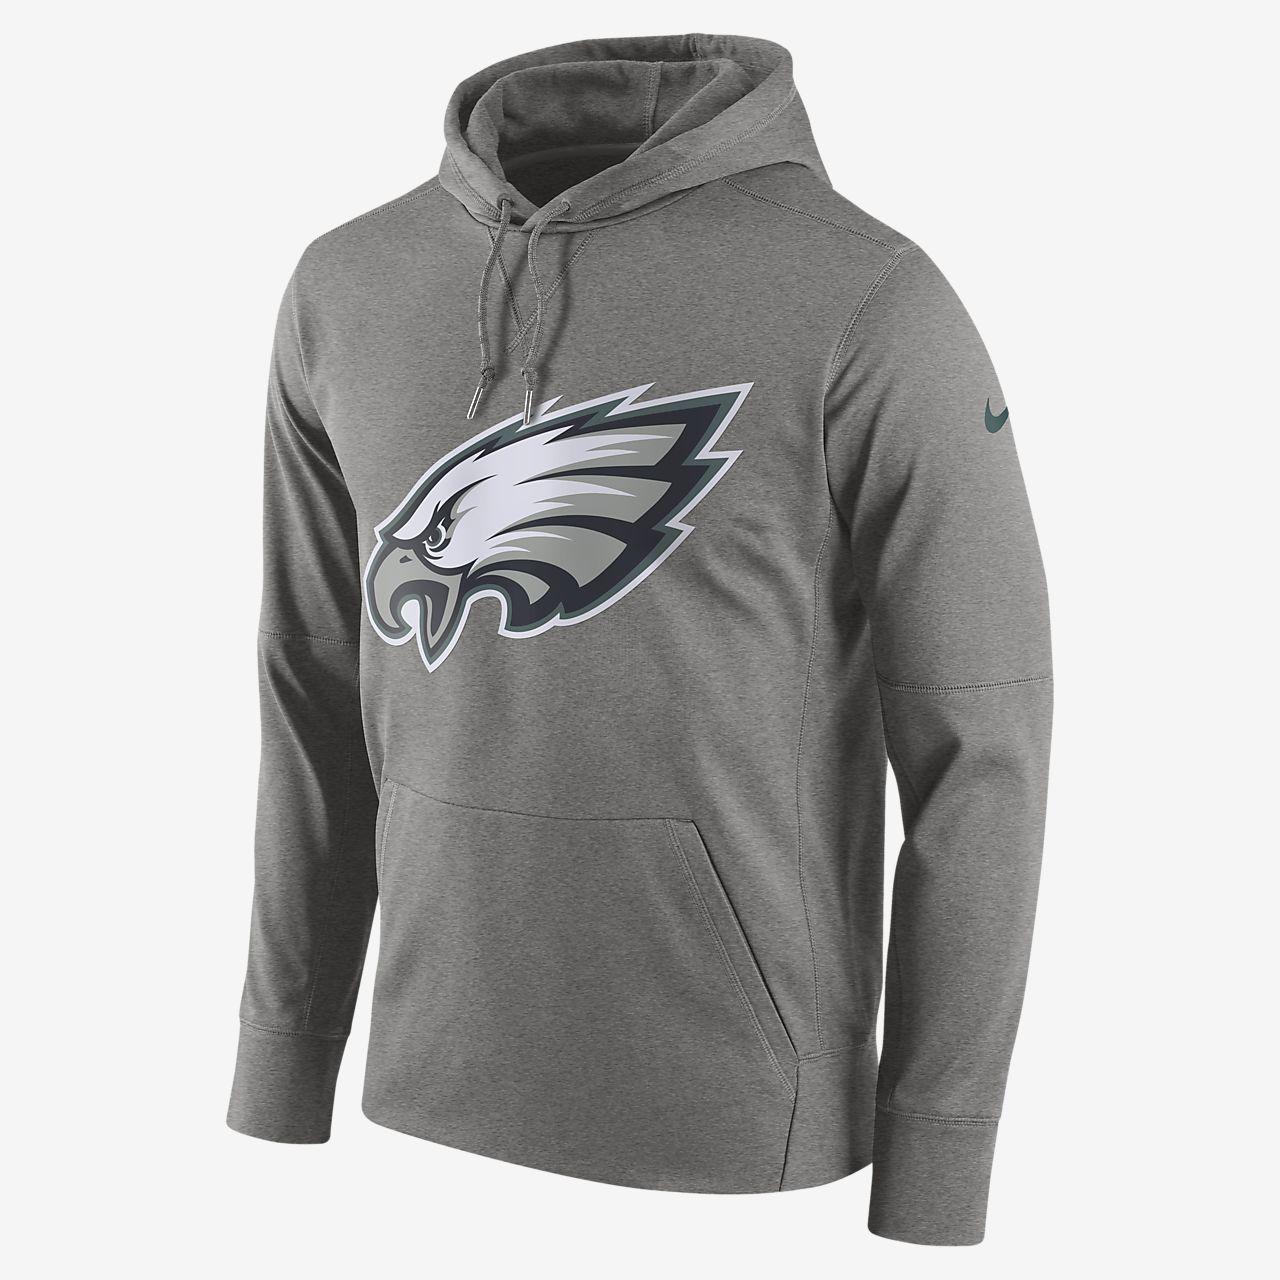 Nike Circuit Logo Essential (NFL Eagles) kapucnis, belebújós férfipulóver